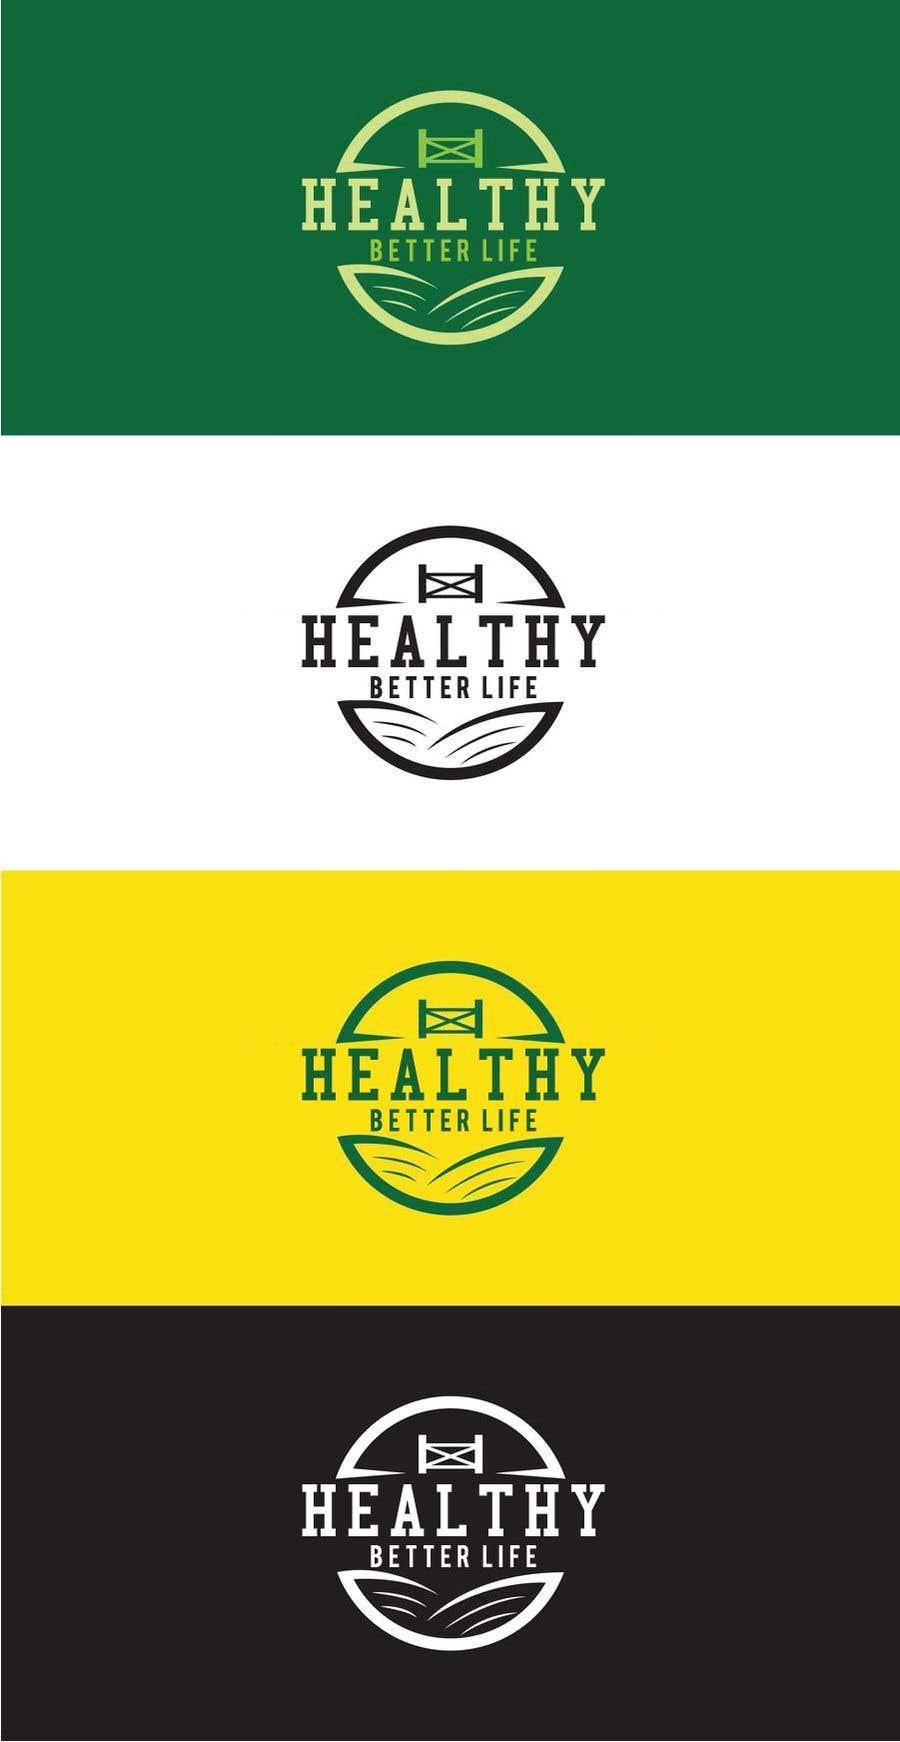 Konkurrenceindlæg #123 for Logo for healthy food company